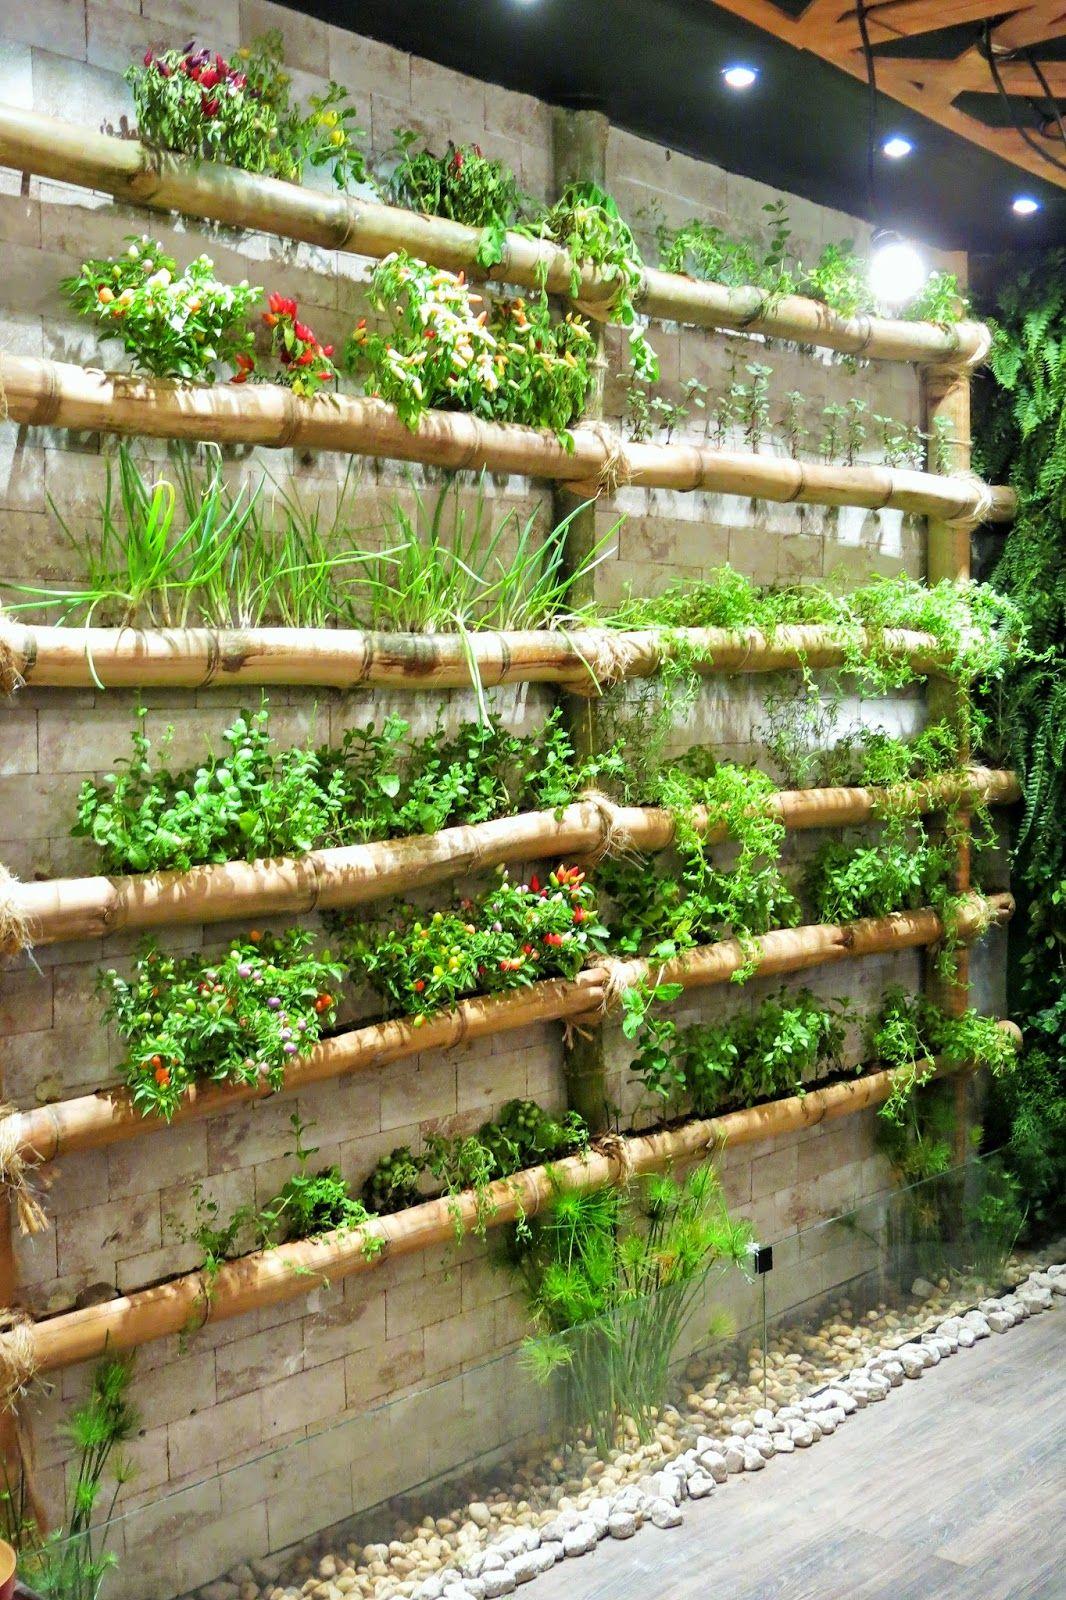 Blog da andrea rudge plantation pinterest jardins for Amenagement jardin recup